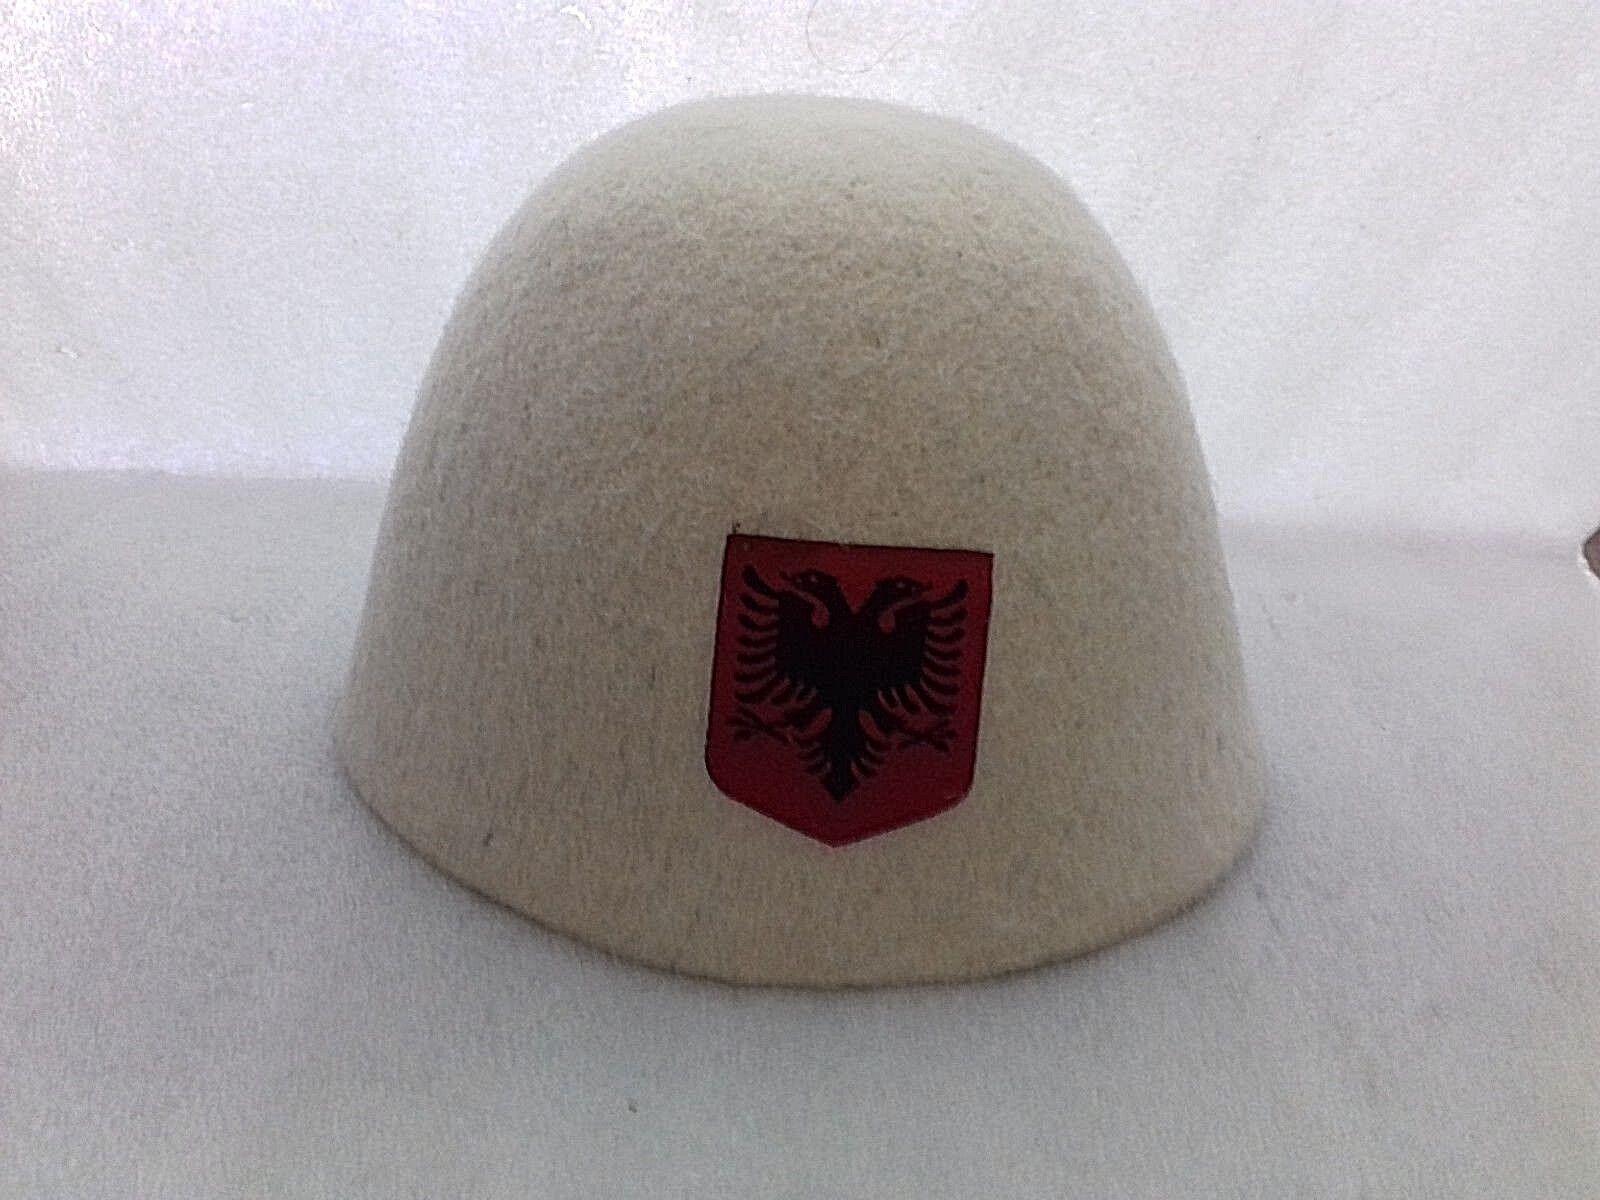 ALBANIA HAT TRADITIONAL WOOL HAT ALBANIA FOLK QELESHE PLIS-HANDMADE-WOOL-EAGLE EMBLEM-CUTE 6cfe0d